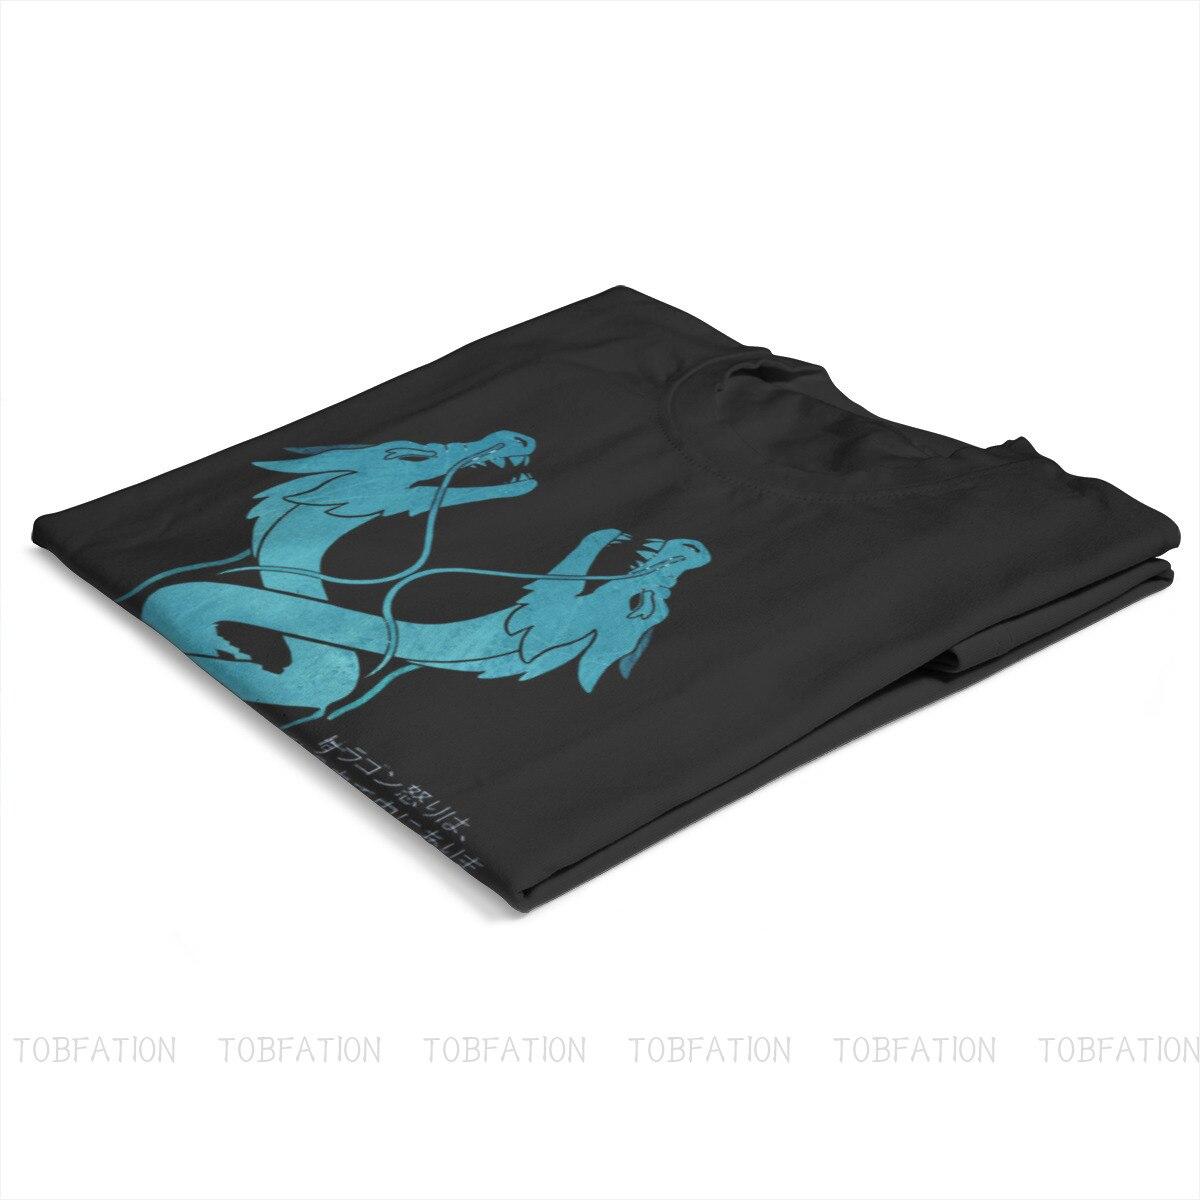 Ryuu Ga Waga Teki Wo Kurau Round Collar TShirt Overwatch Pure Cotton Basic T Shirt Man's Tops Fashion Oversized 2